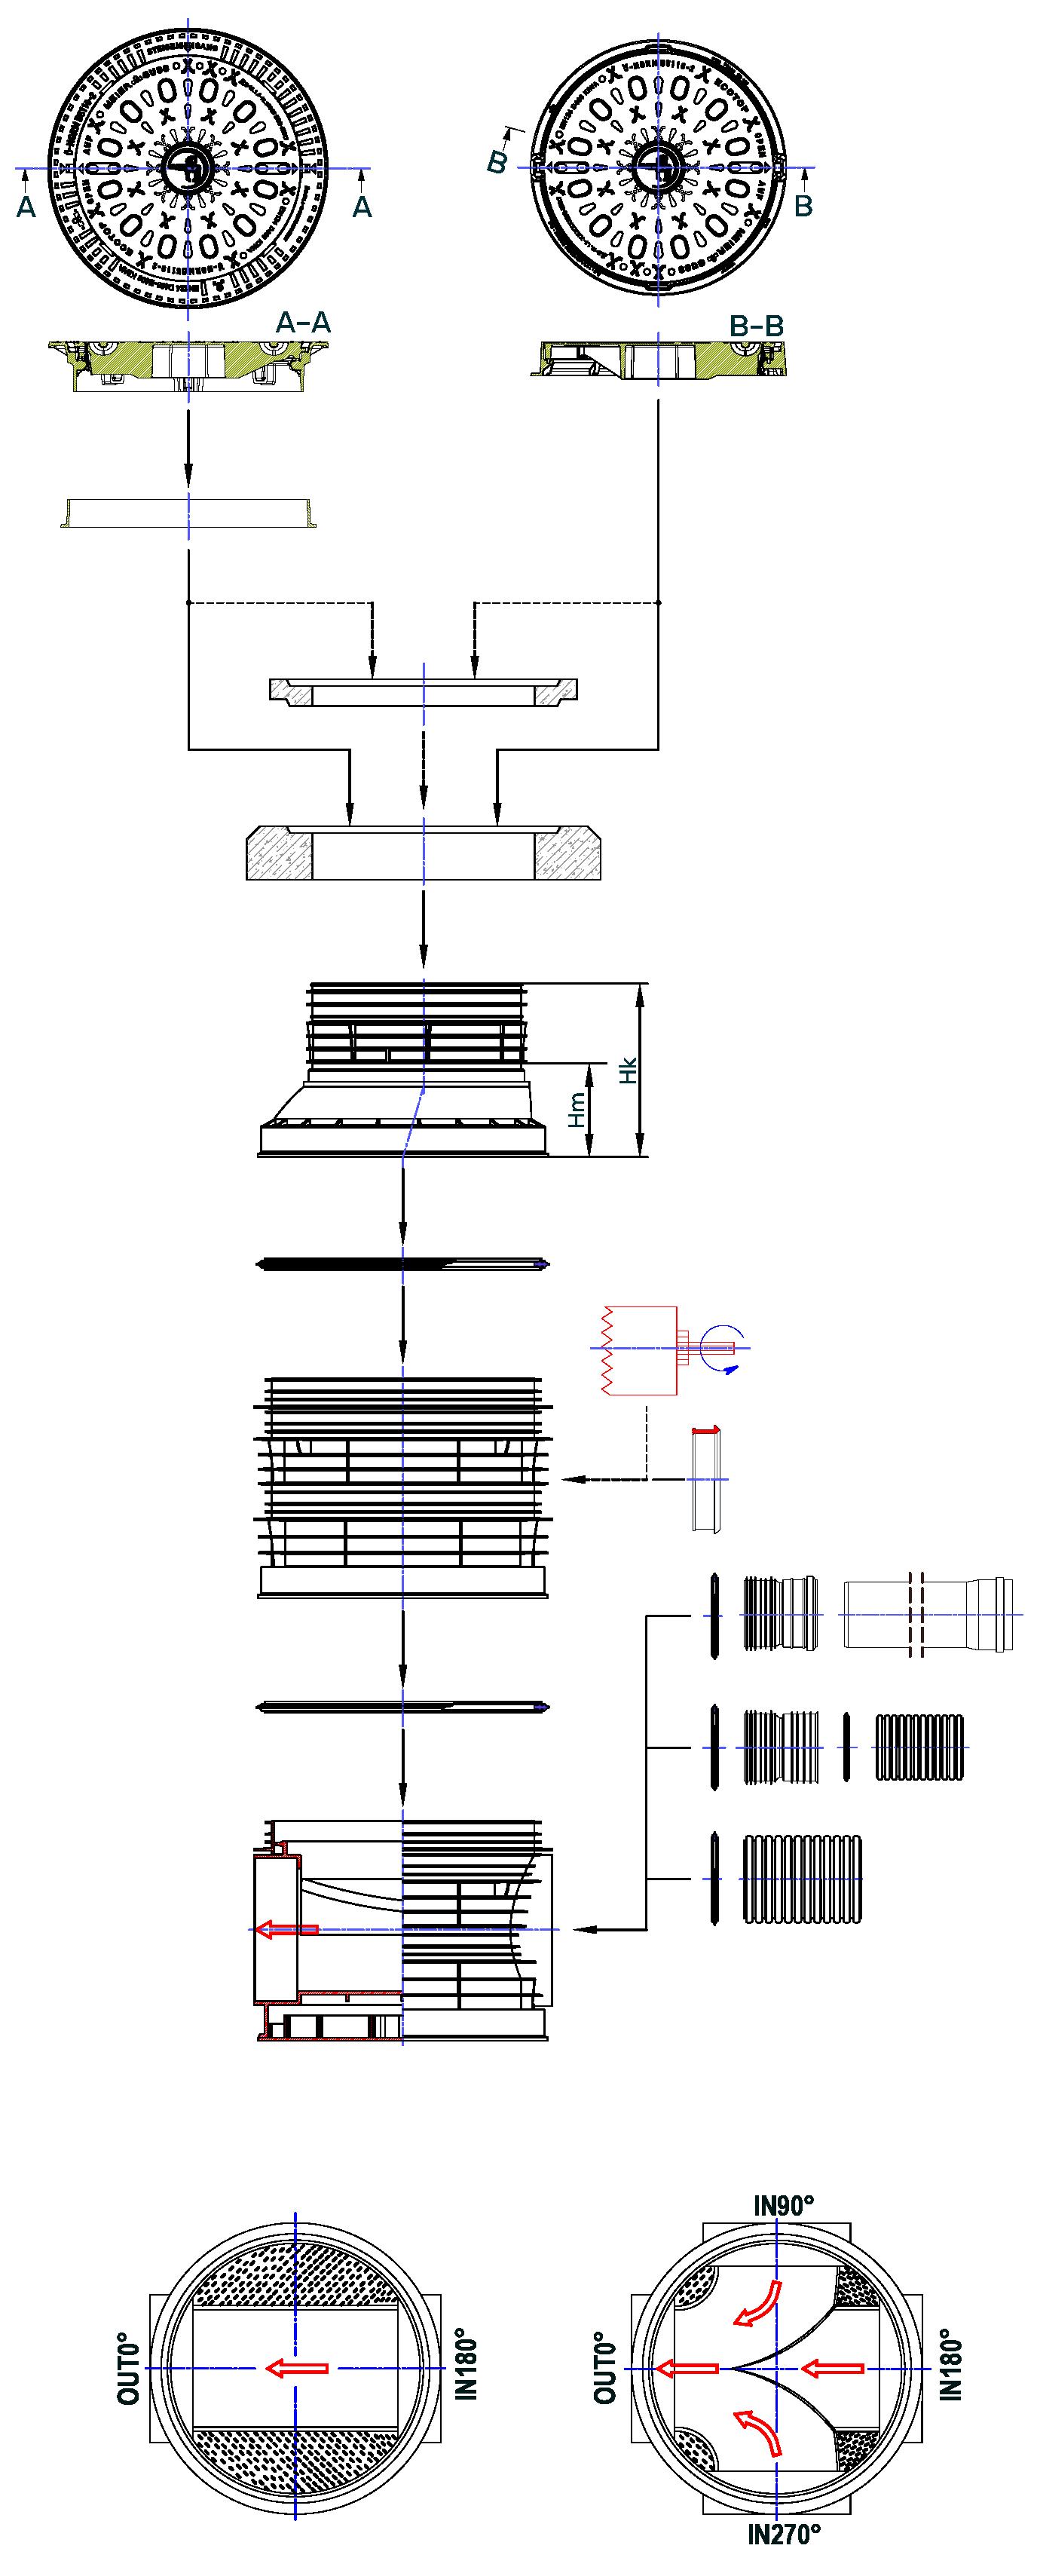 Manhole DN 800.630